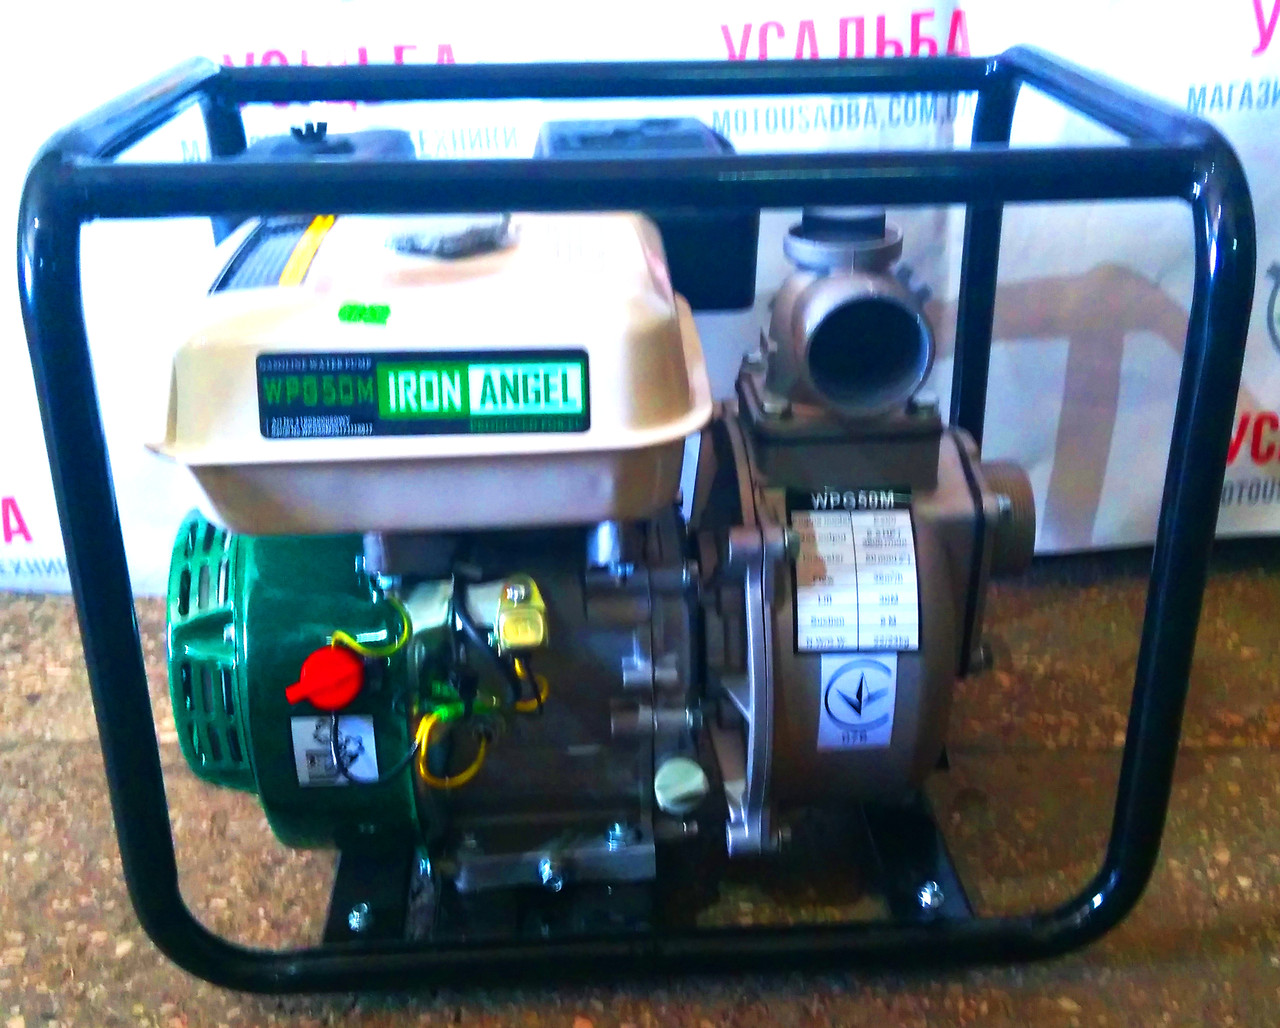 Бензиновая мотопомпа с ручным запуском Iron Angel WPG 50 (36куб\ч)